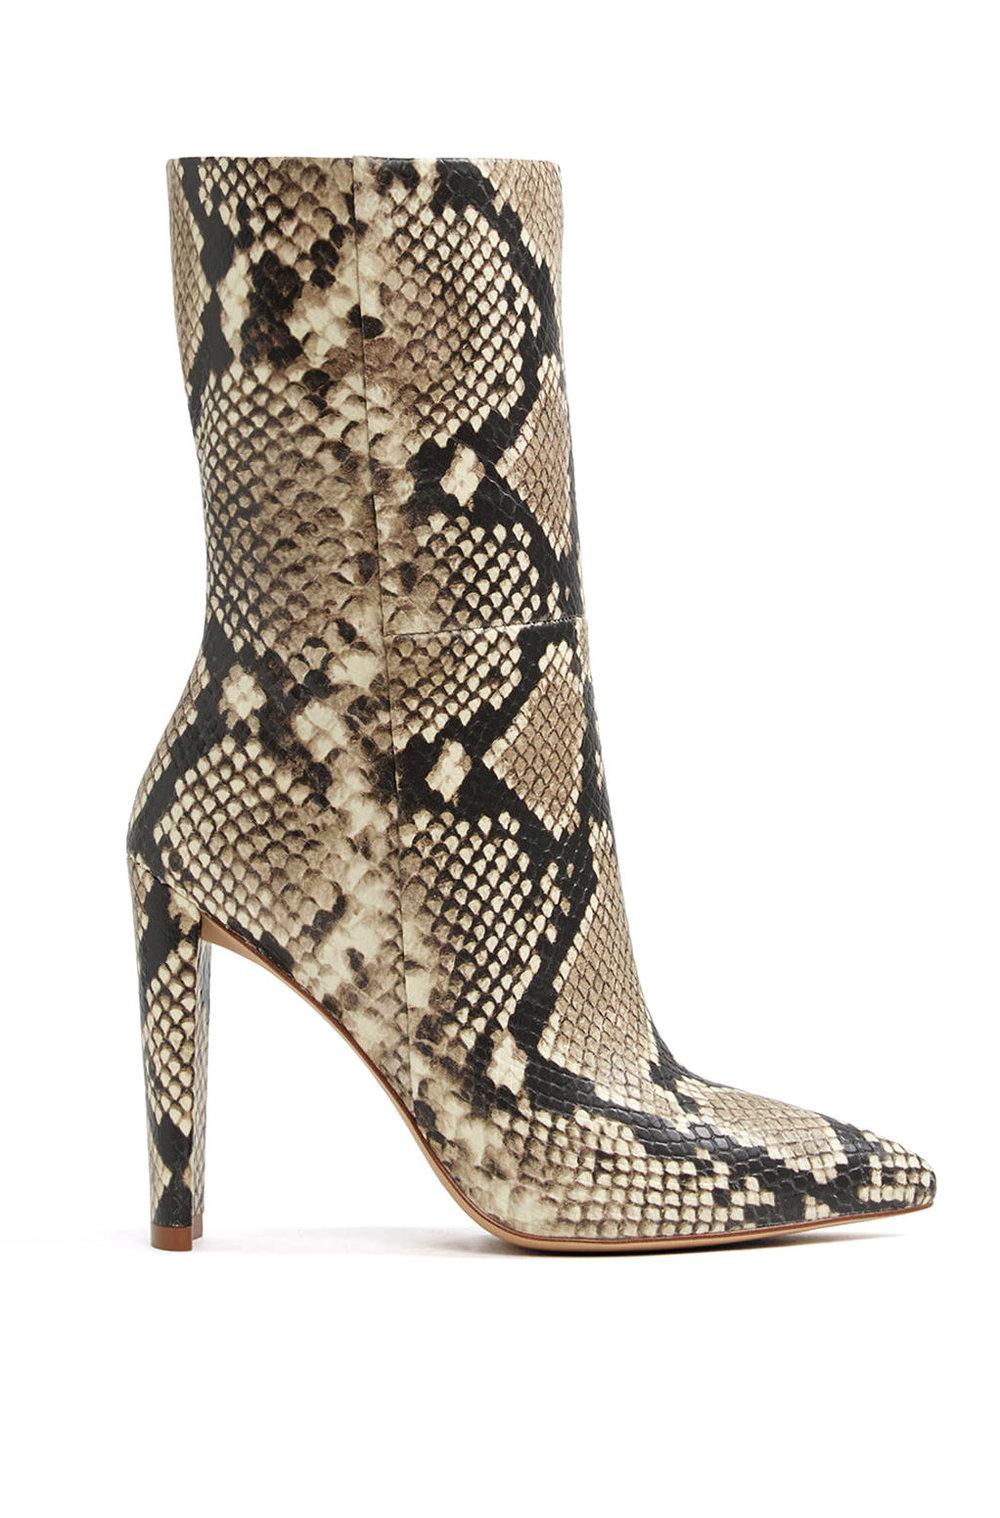 Aldo Snakeskin Boots       $150